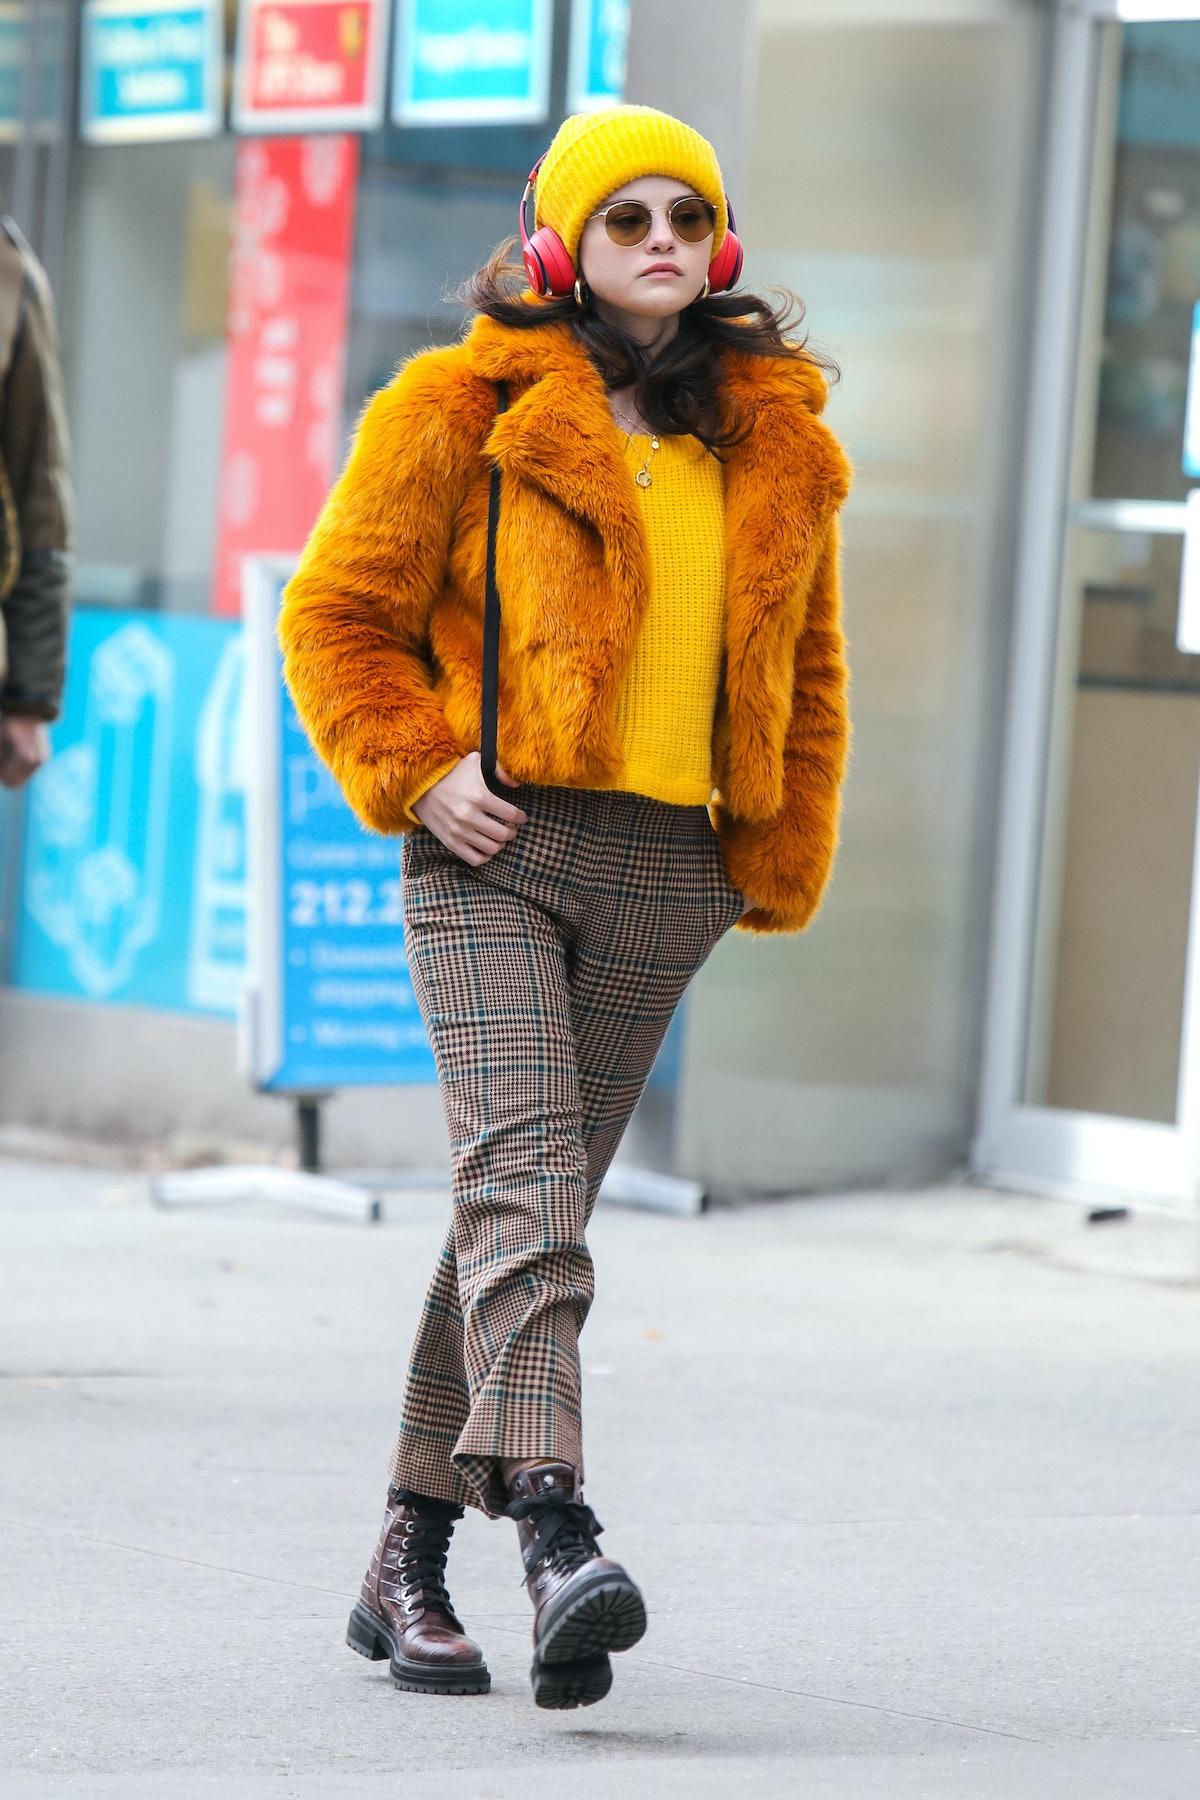 Selena Gomez wearing orange and yellow